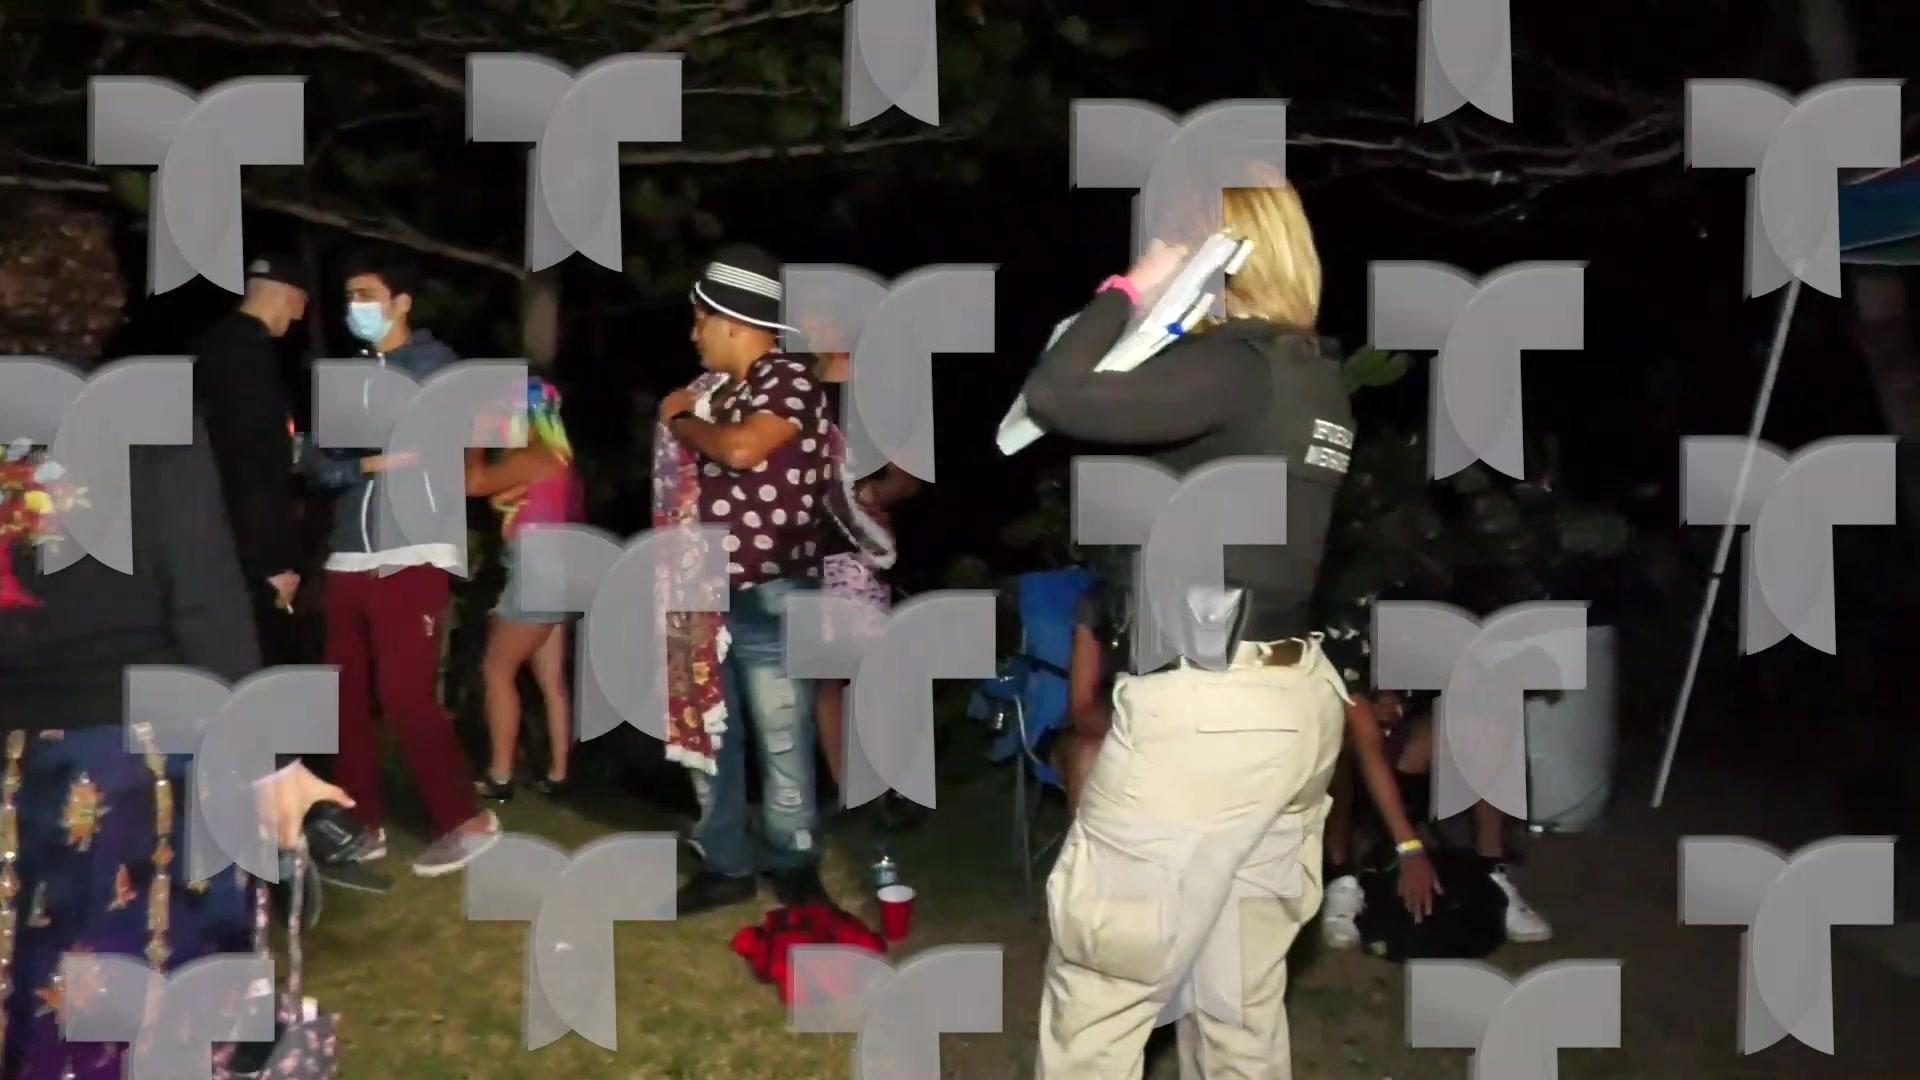 Salud interviene con fiesta de musica electronica en Aguada